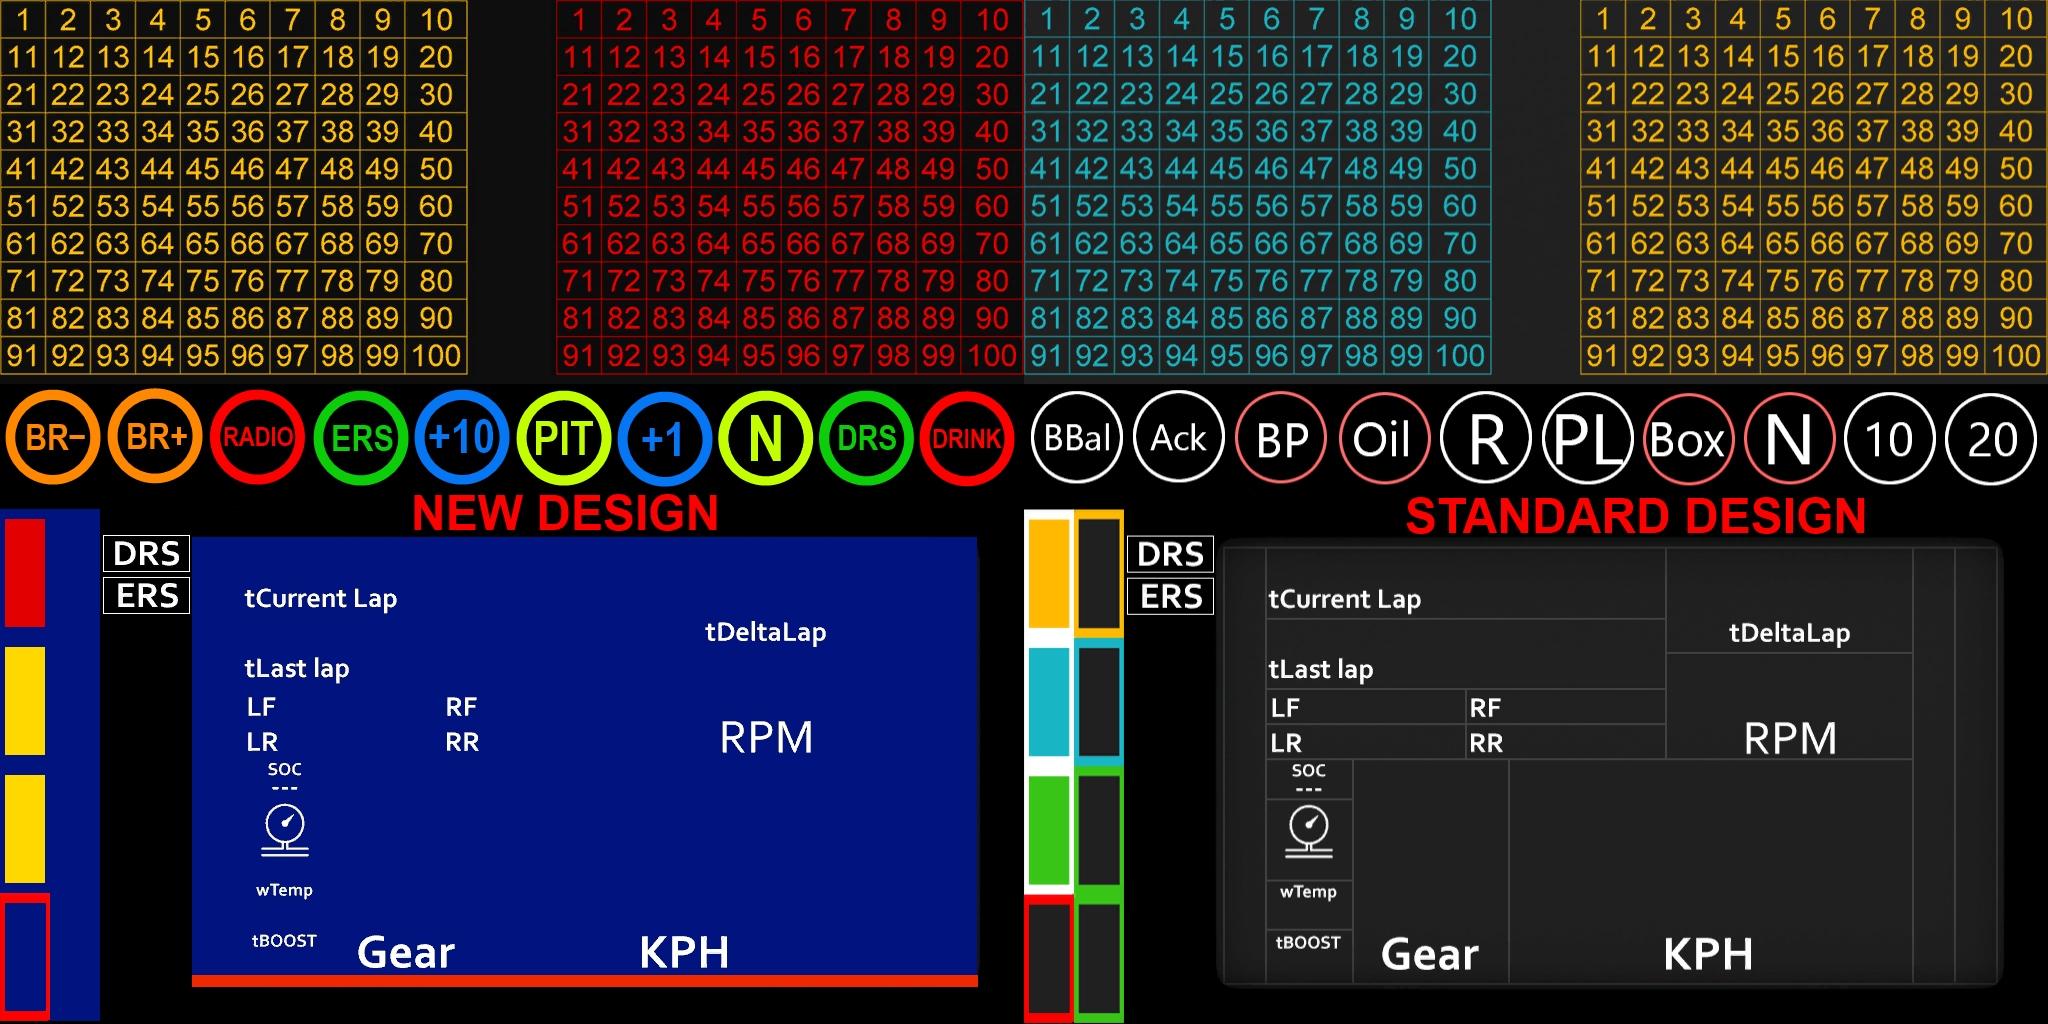 Red_Bull_Porsche_LCD_Display.jpg